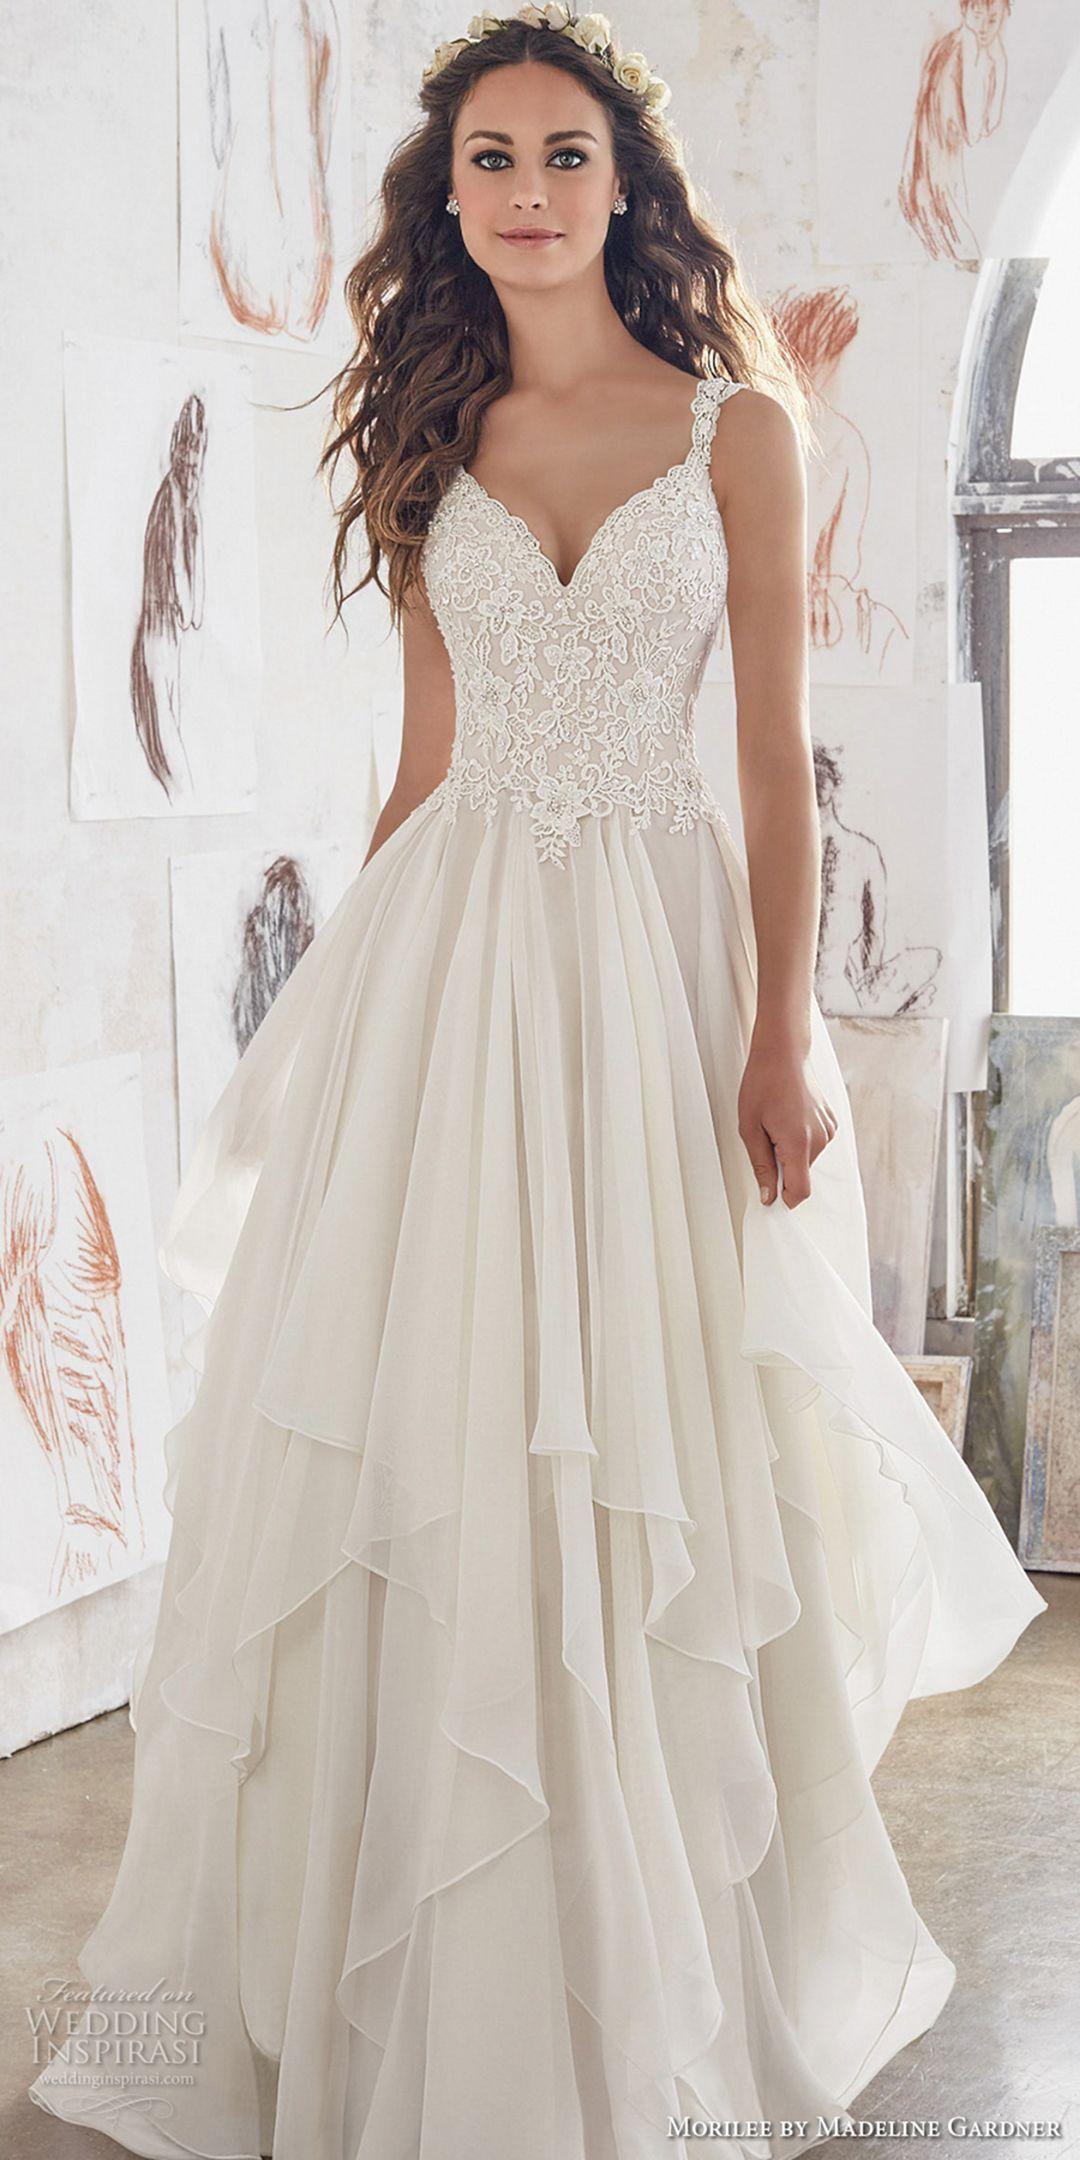 lovely spring wedding dresses design ideas for bride vestidos